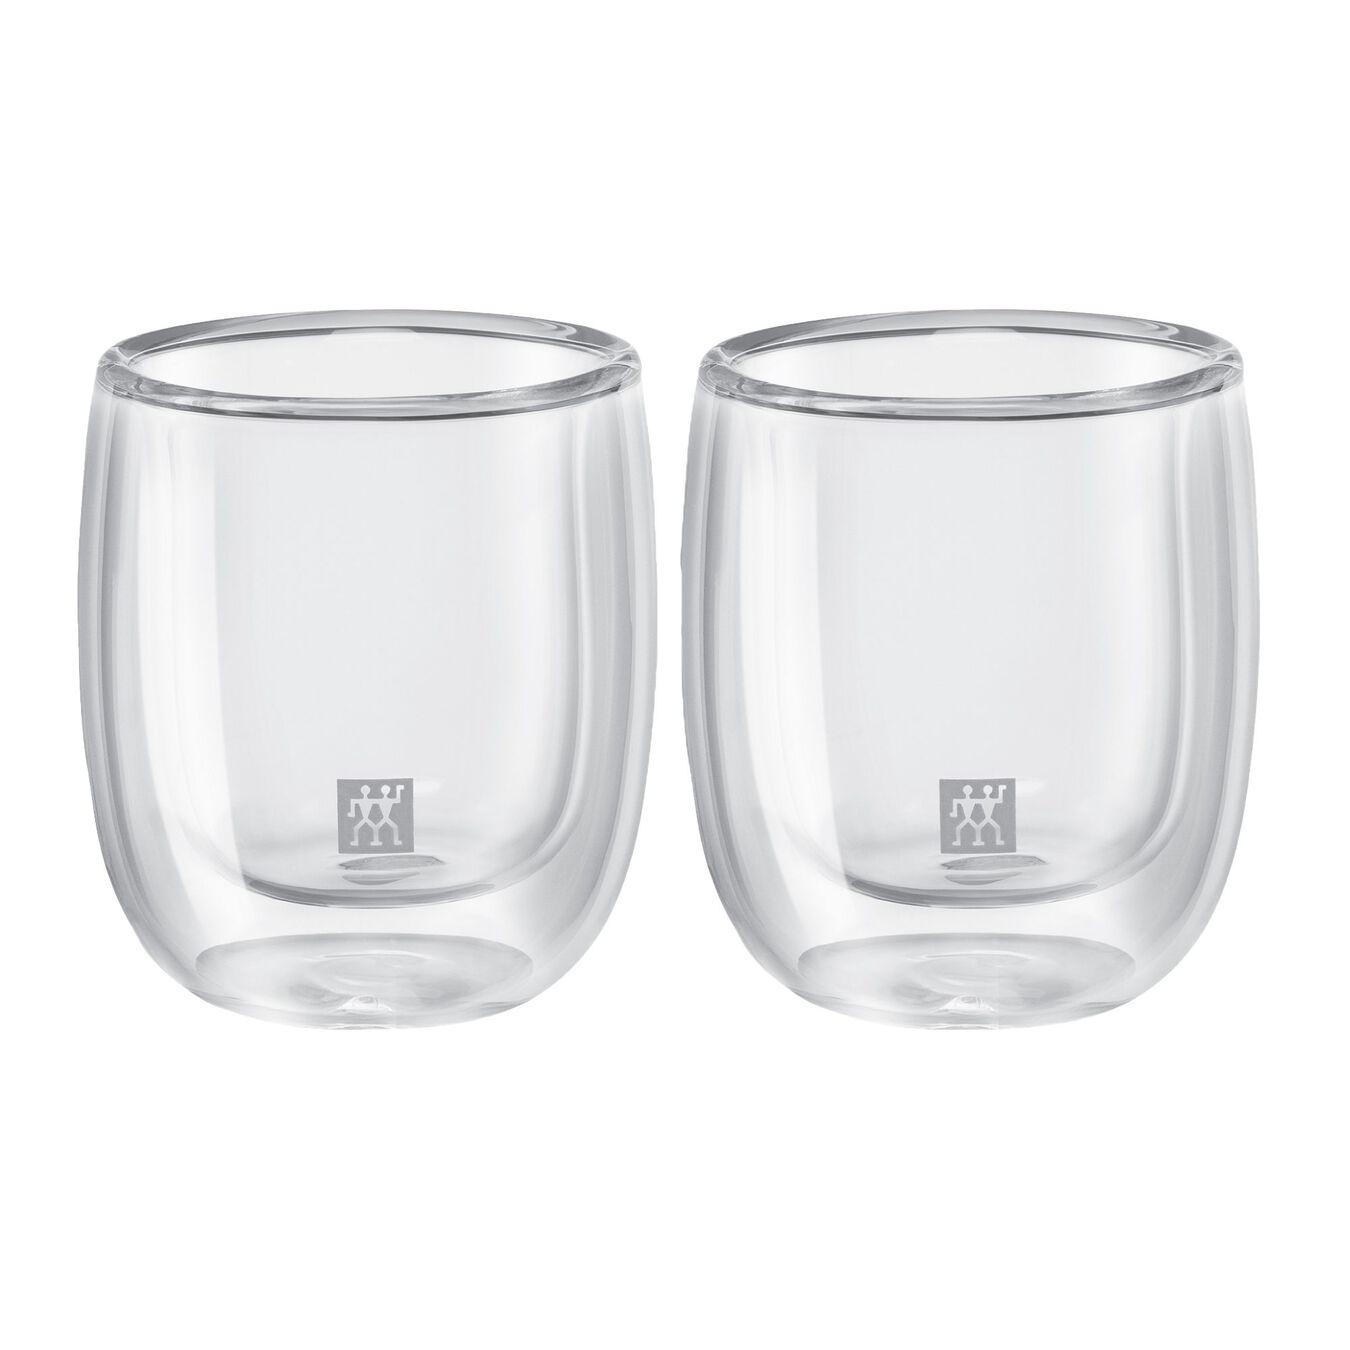 Çift Camlı Espresso bardağı seti, 2-parça,,large 5